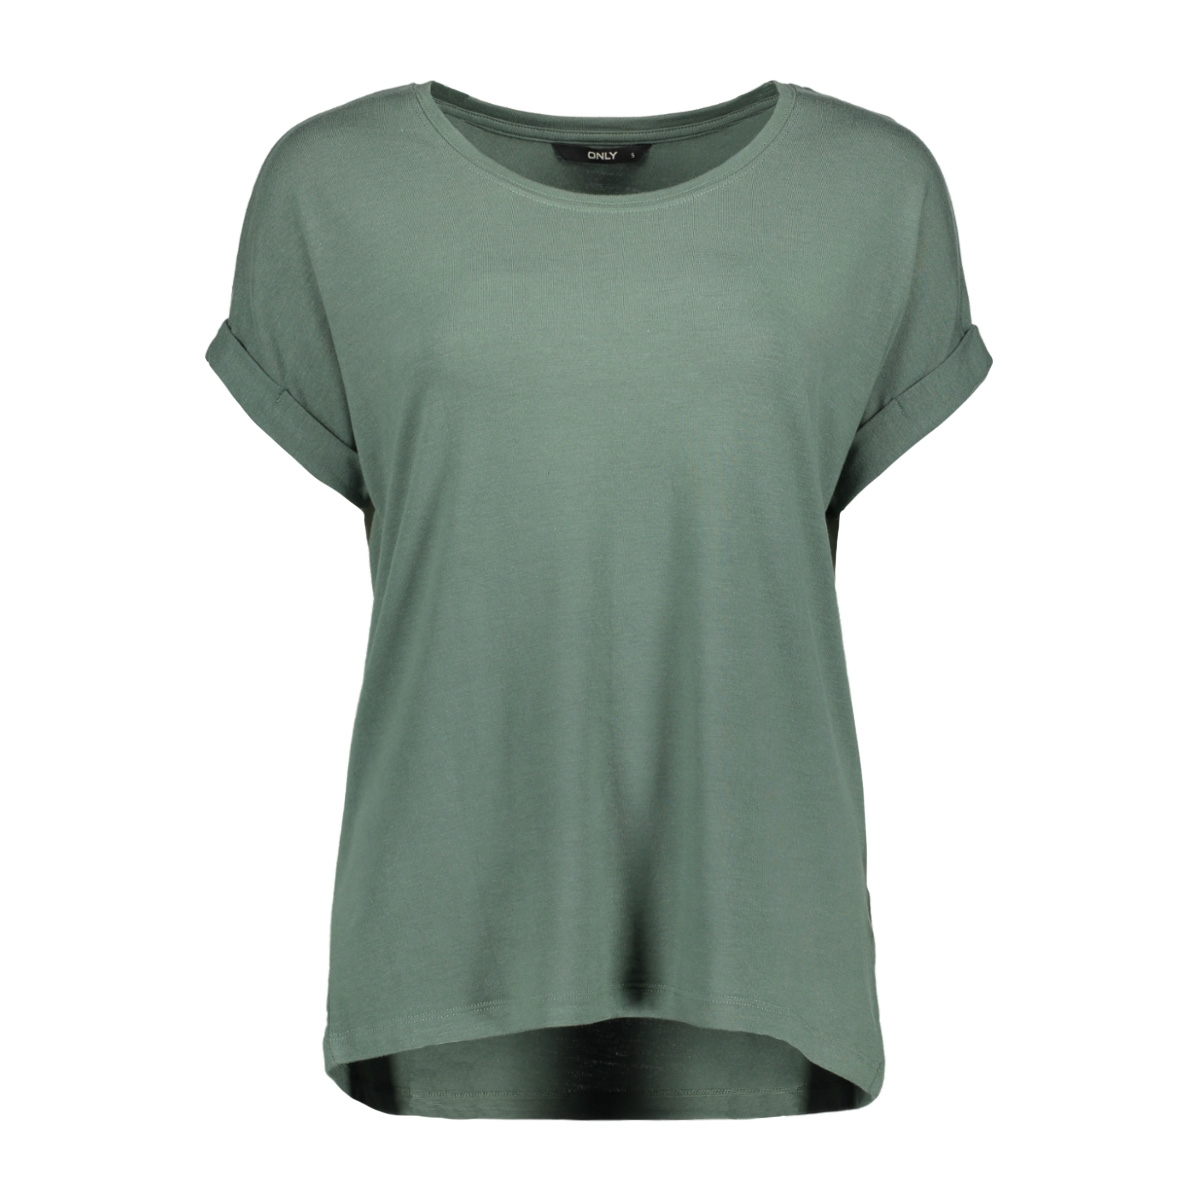 onlmoster s/s o-neck top noos jrs 15106662 only t-shirt laurel wreath